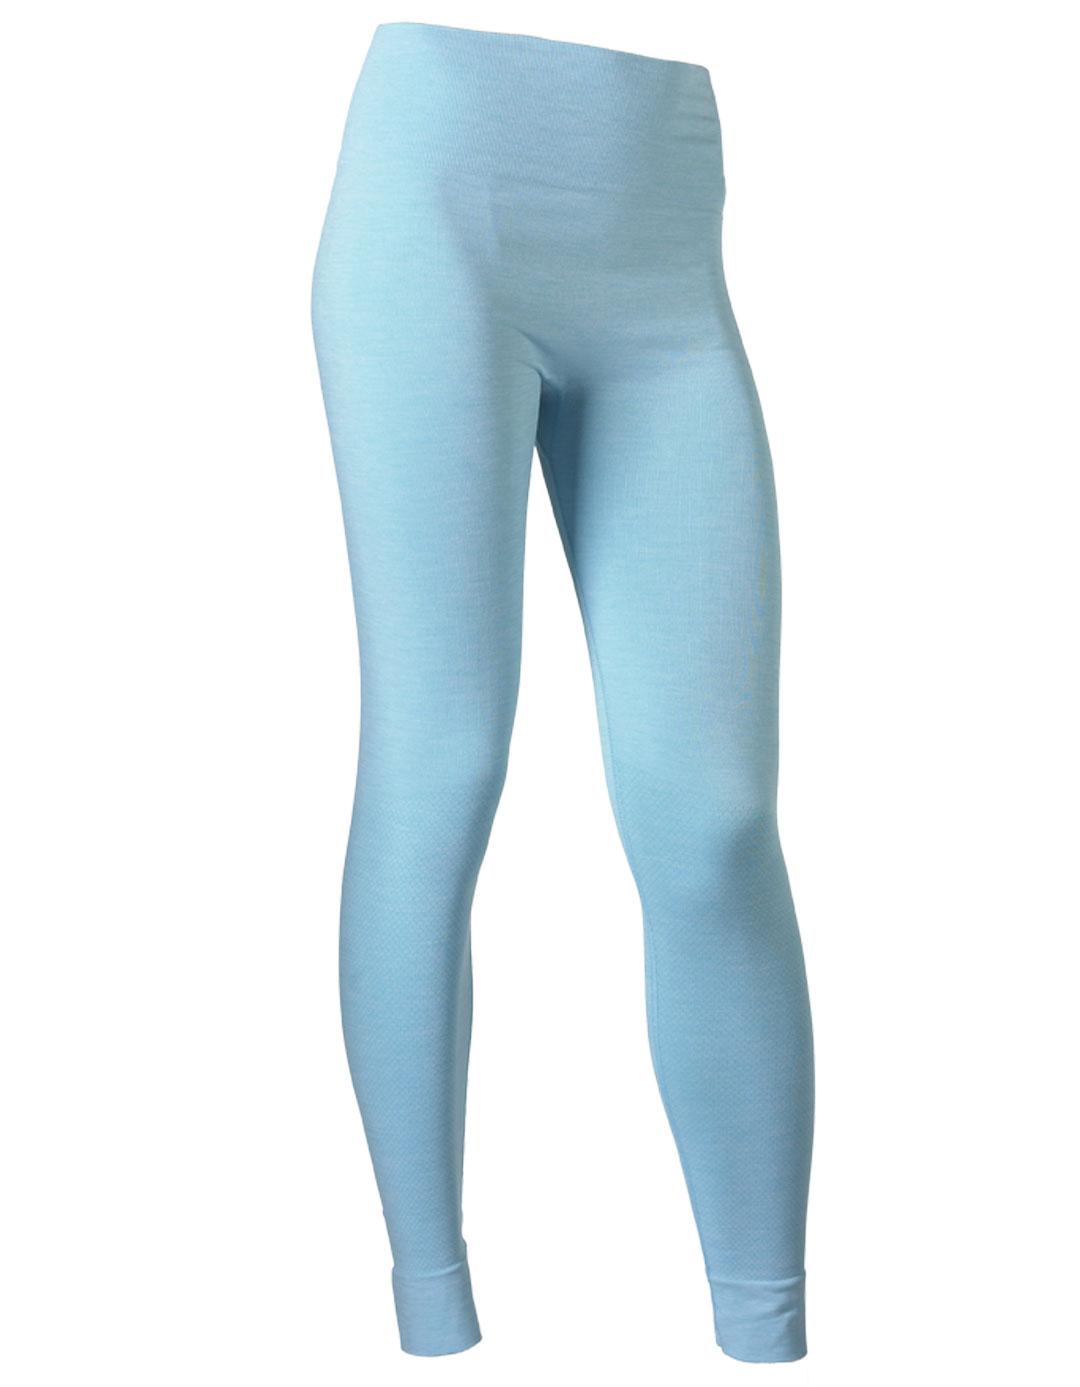 Image of   Bandha Yogabukser - Turquoise / White -L